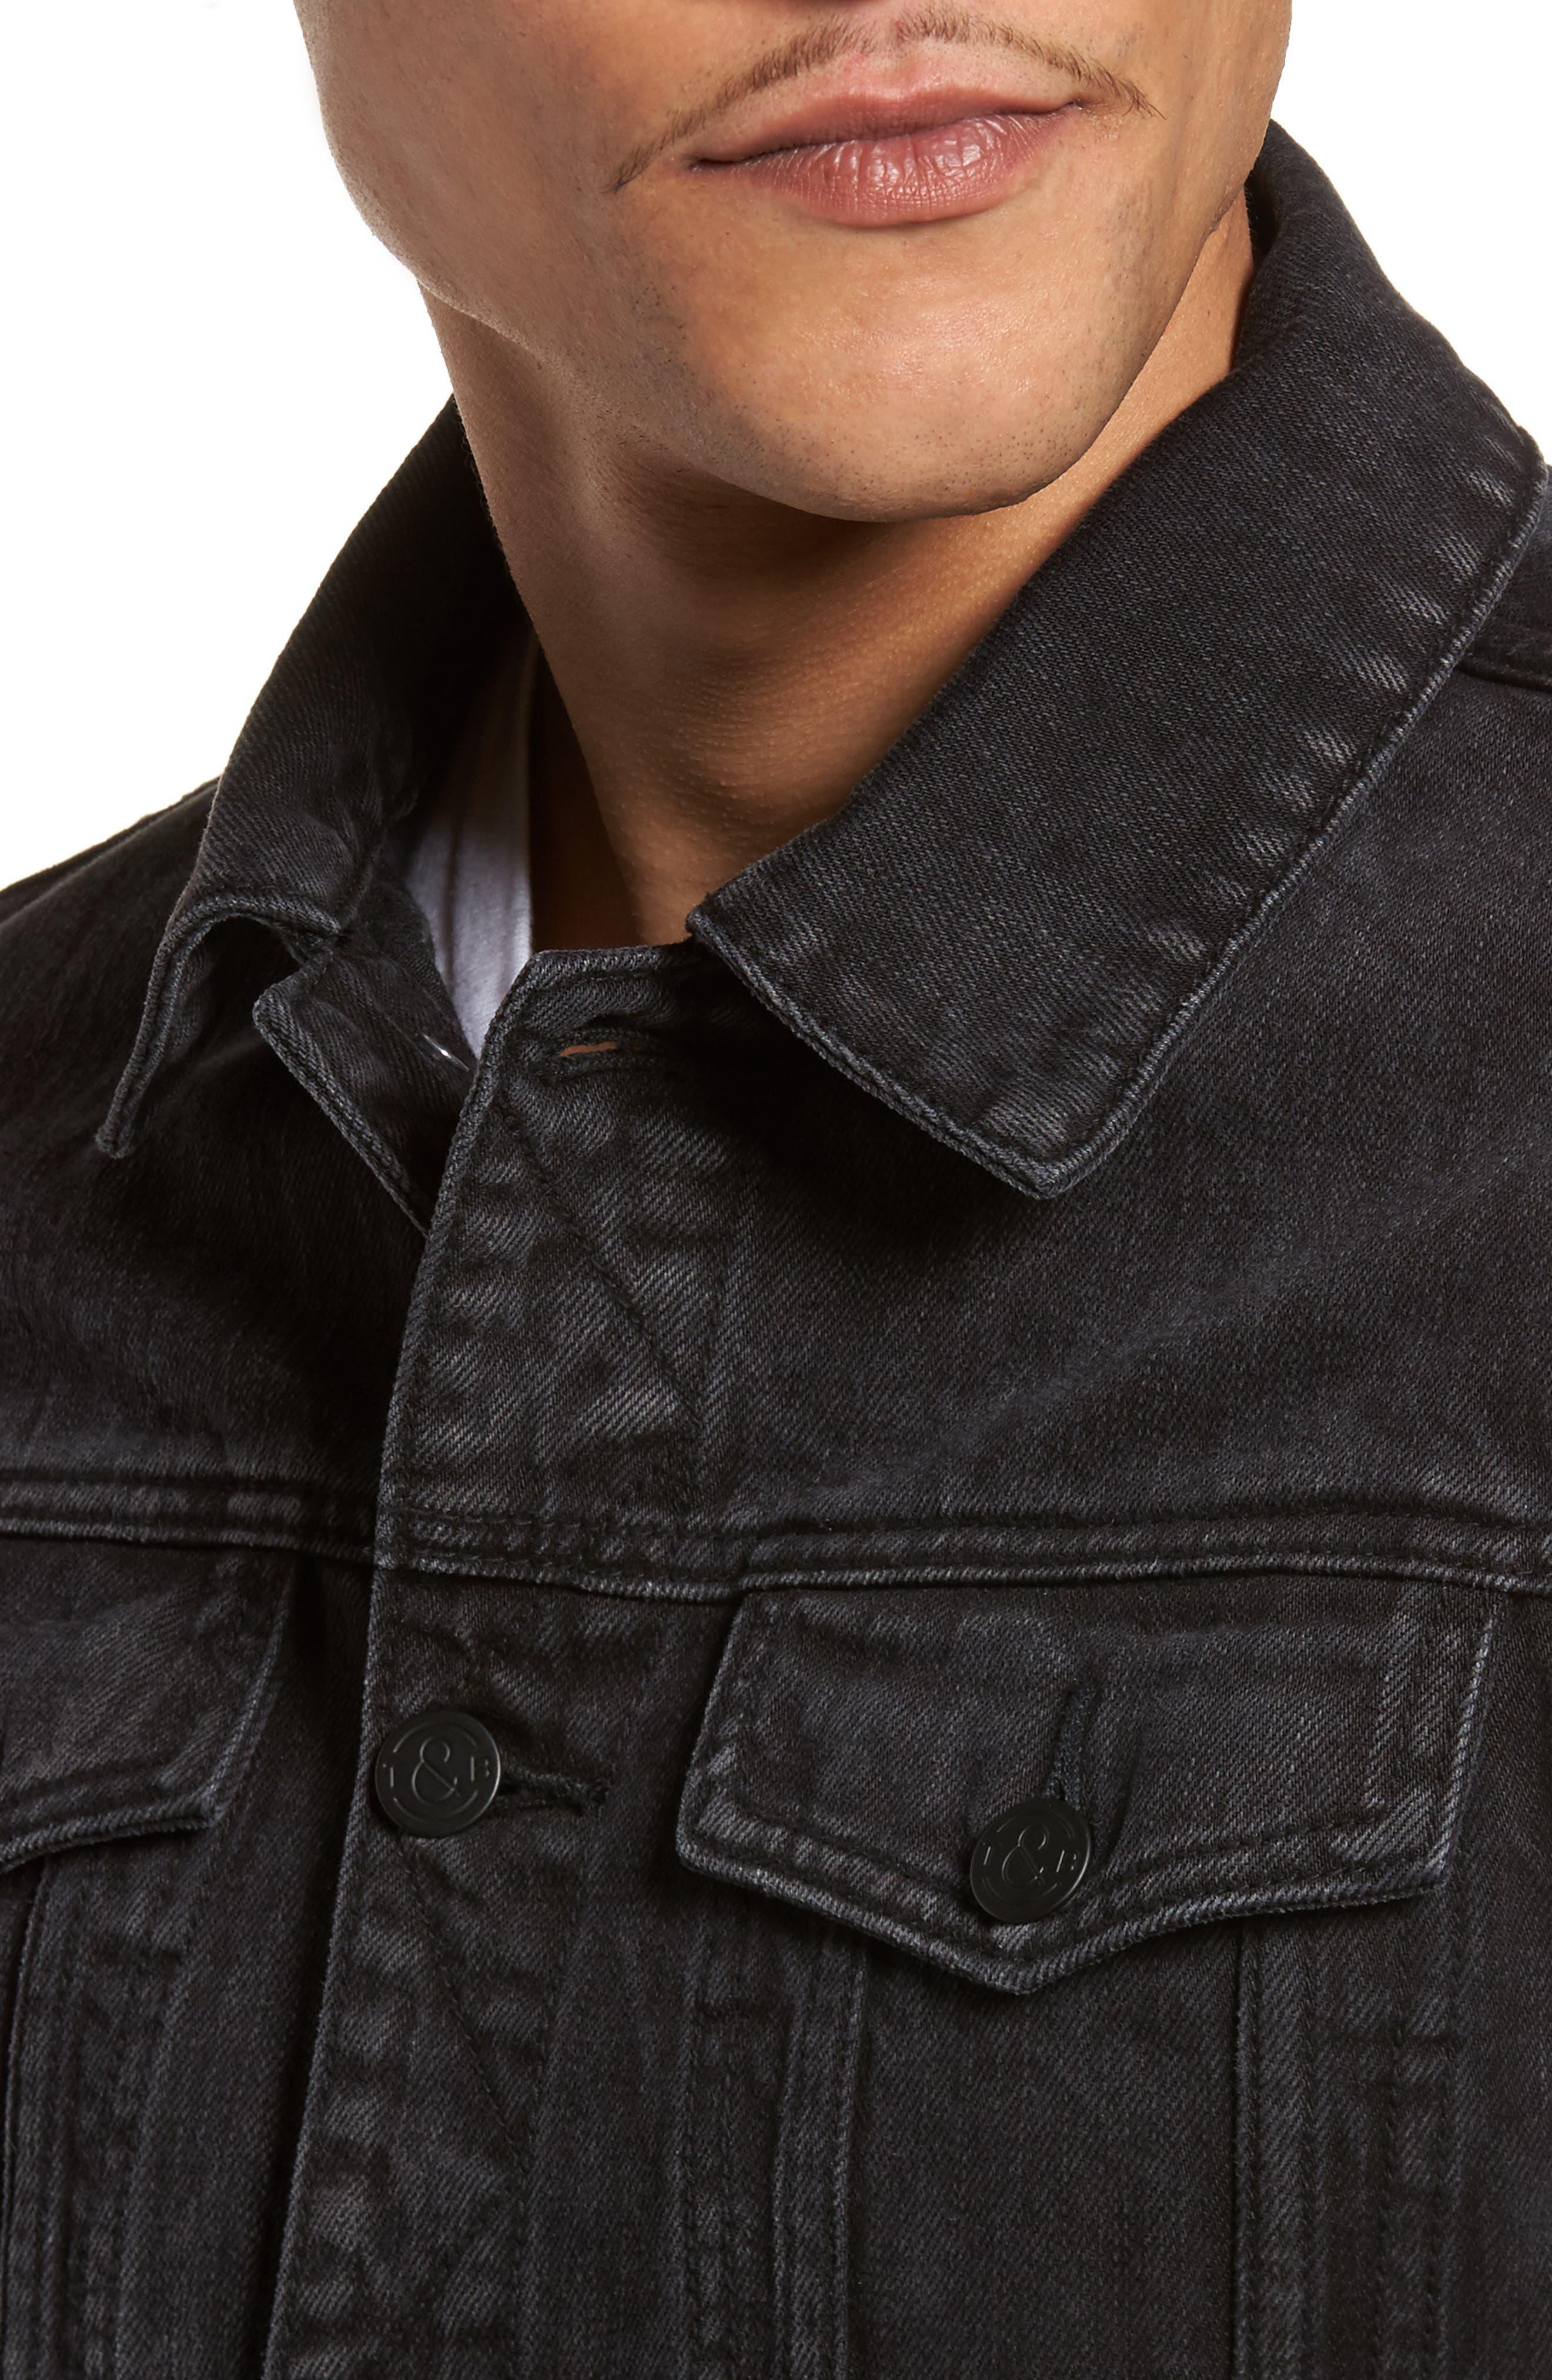 Denim Jacket,                             Alternate thumbnail 4, color,                             001